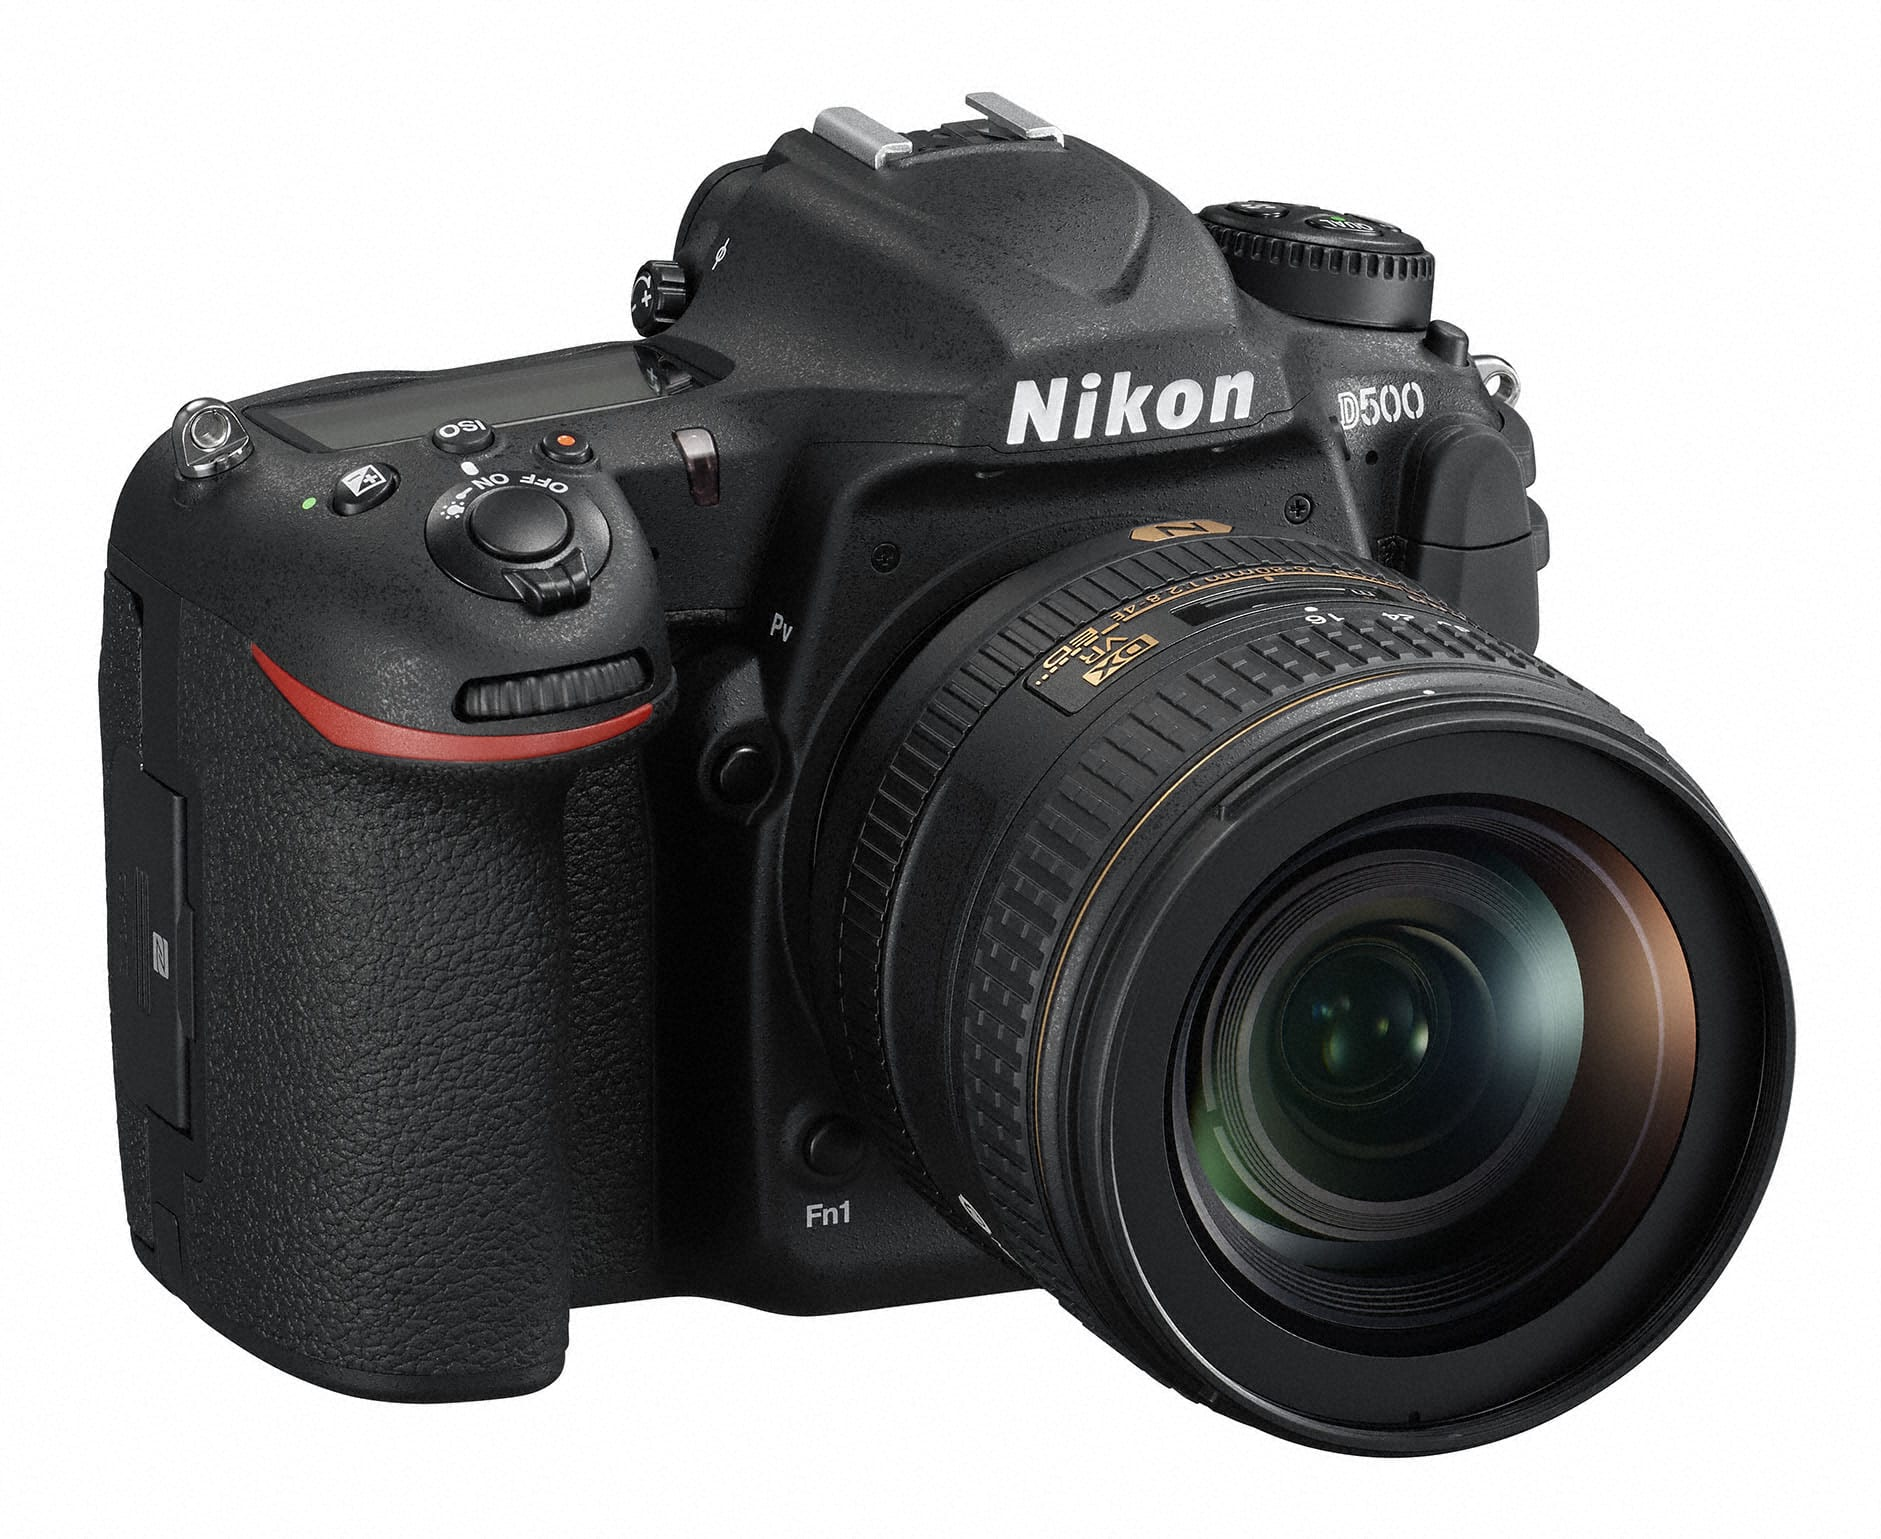 Camera Dslr Camera Models nikon launch new dx format digital slr camera d500 british journal of photography